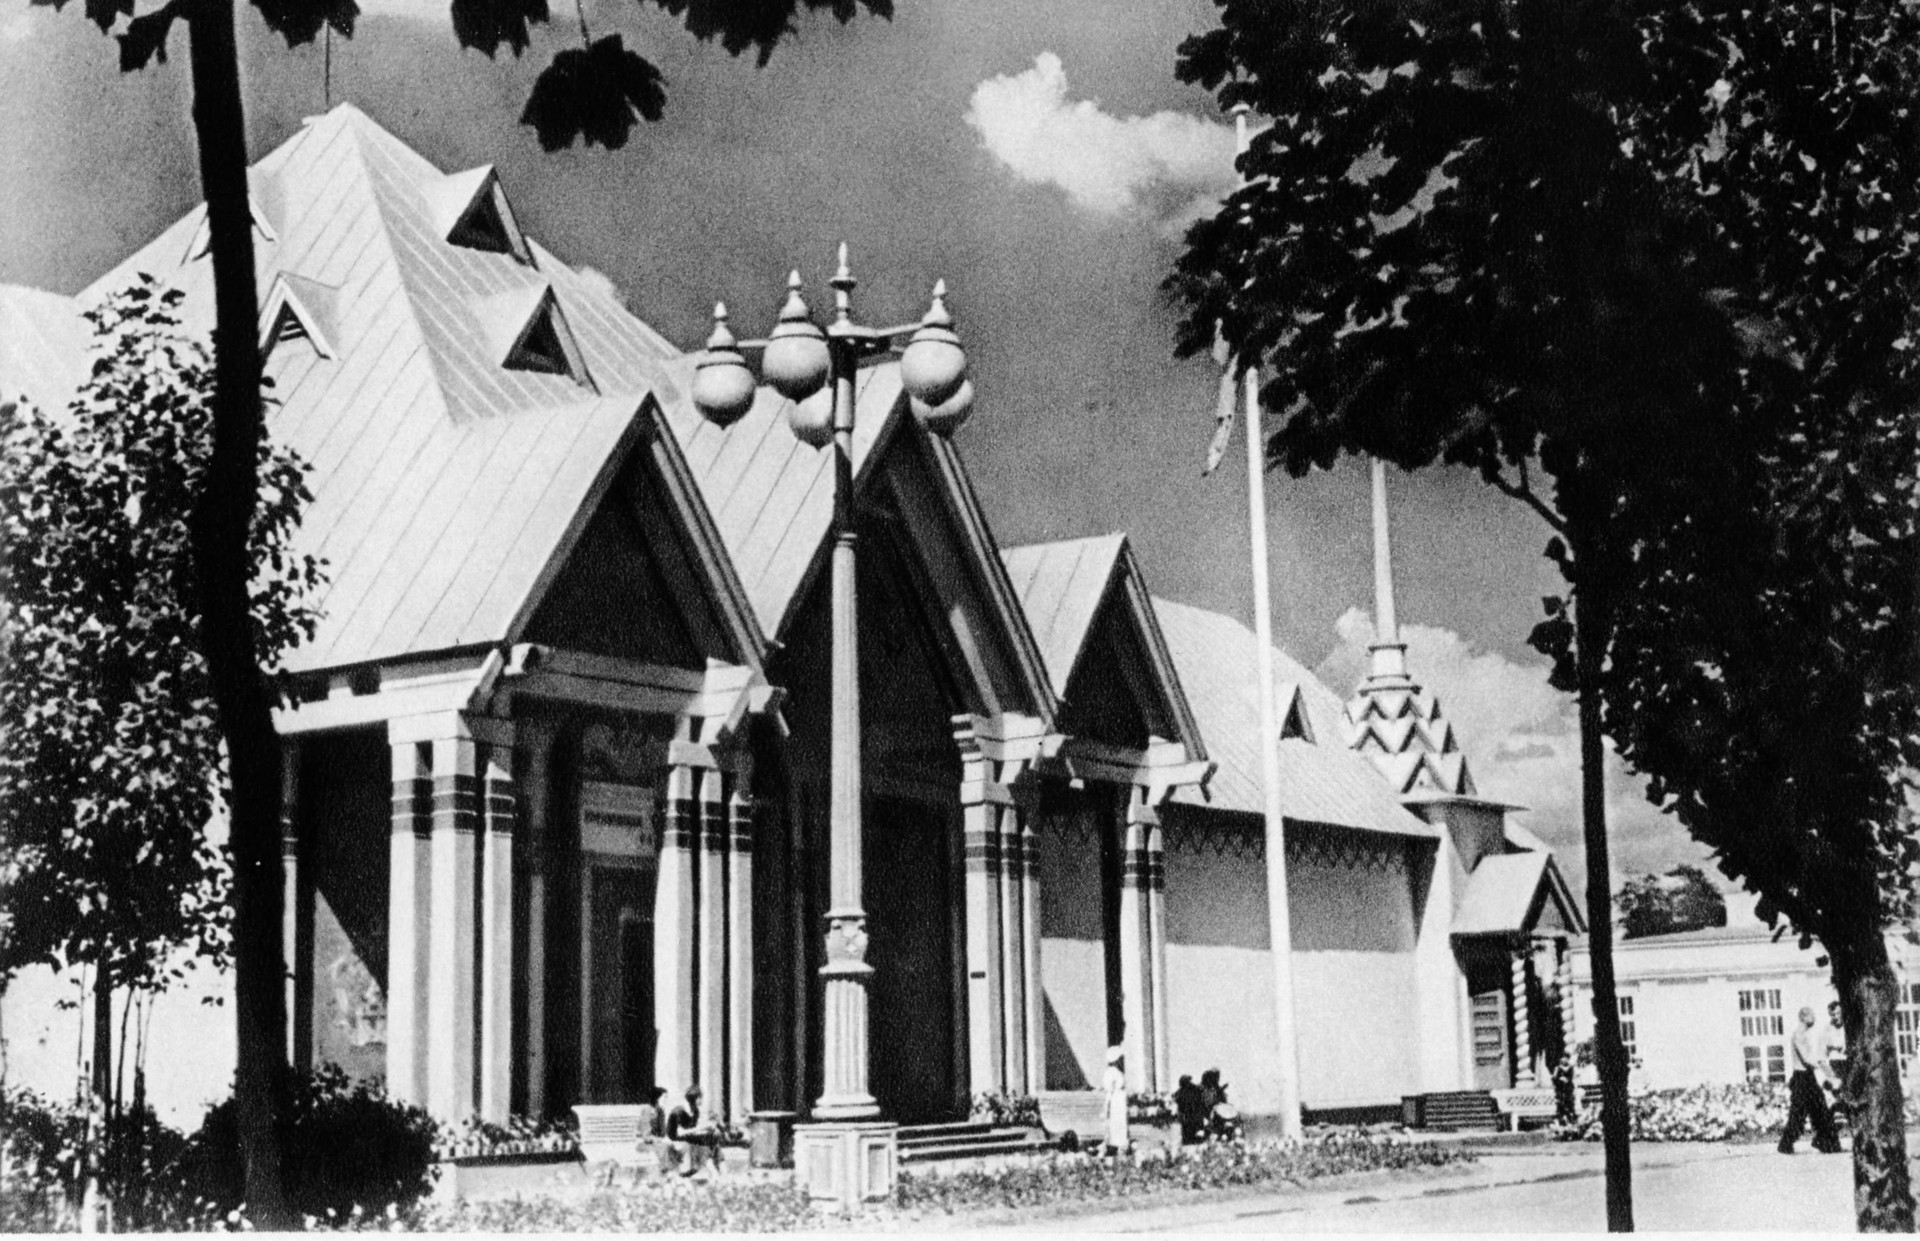 Voronezh, Kursk and Tambov's pavilion